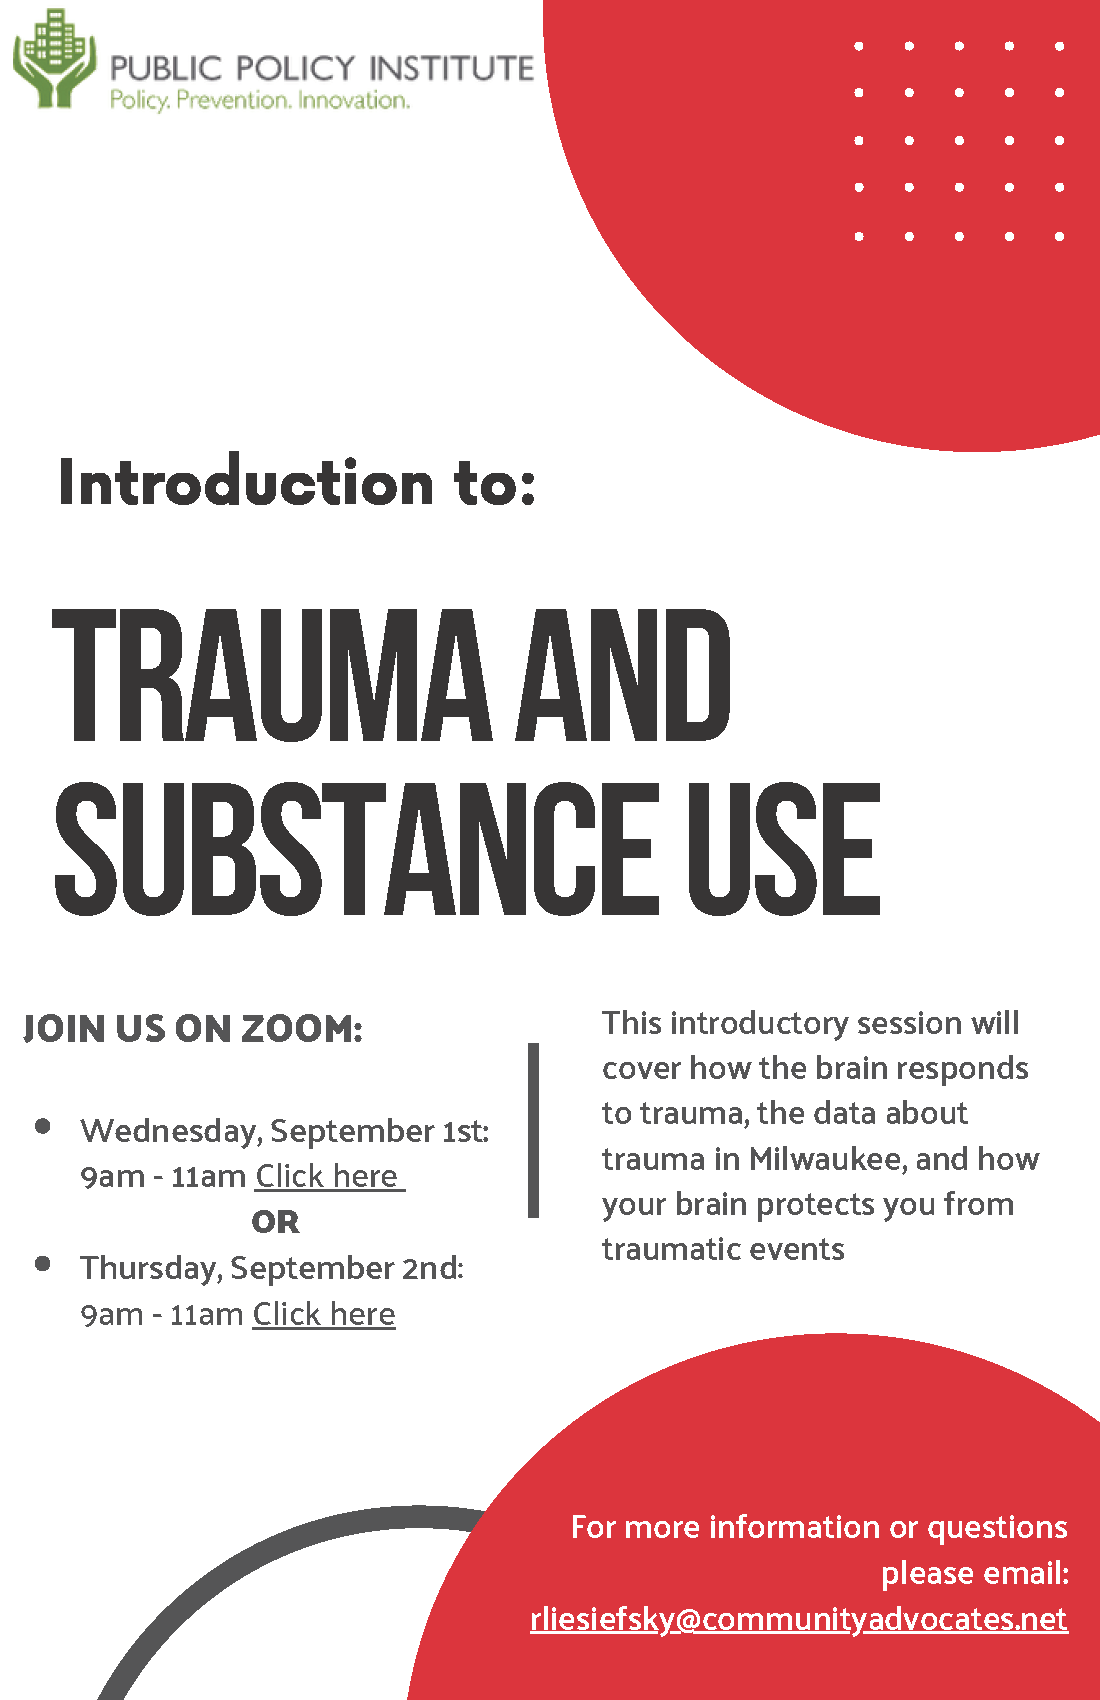 trauma and substance use training flyer